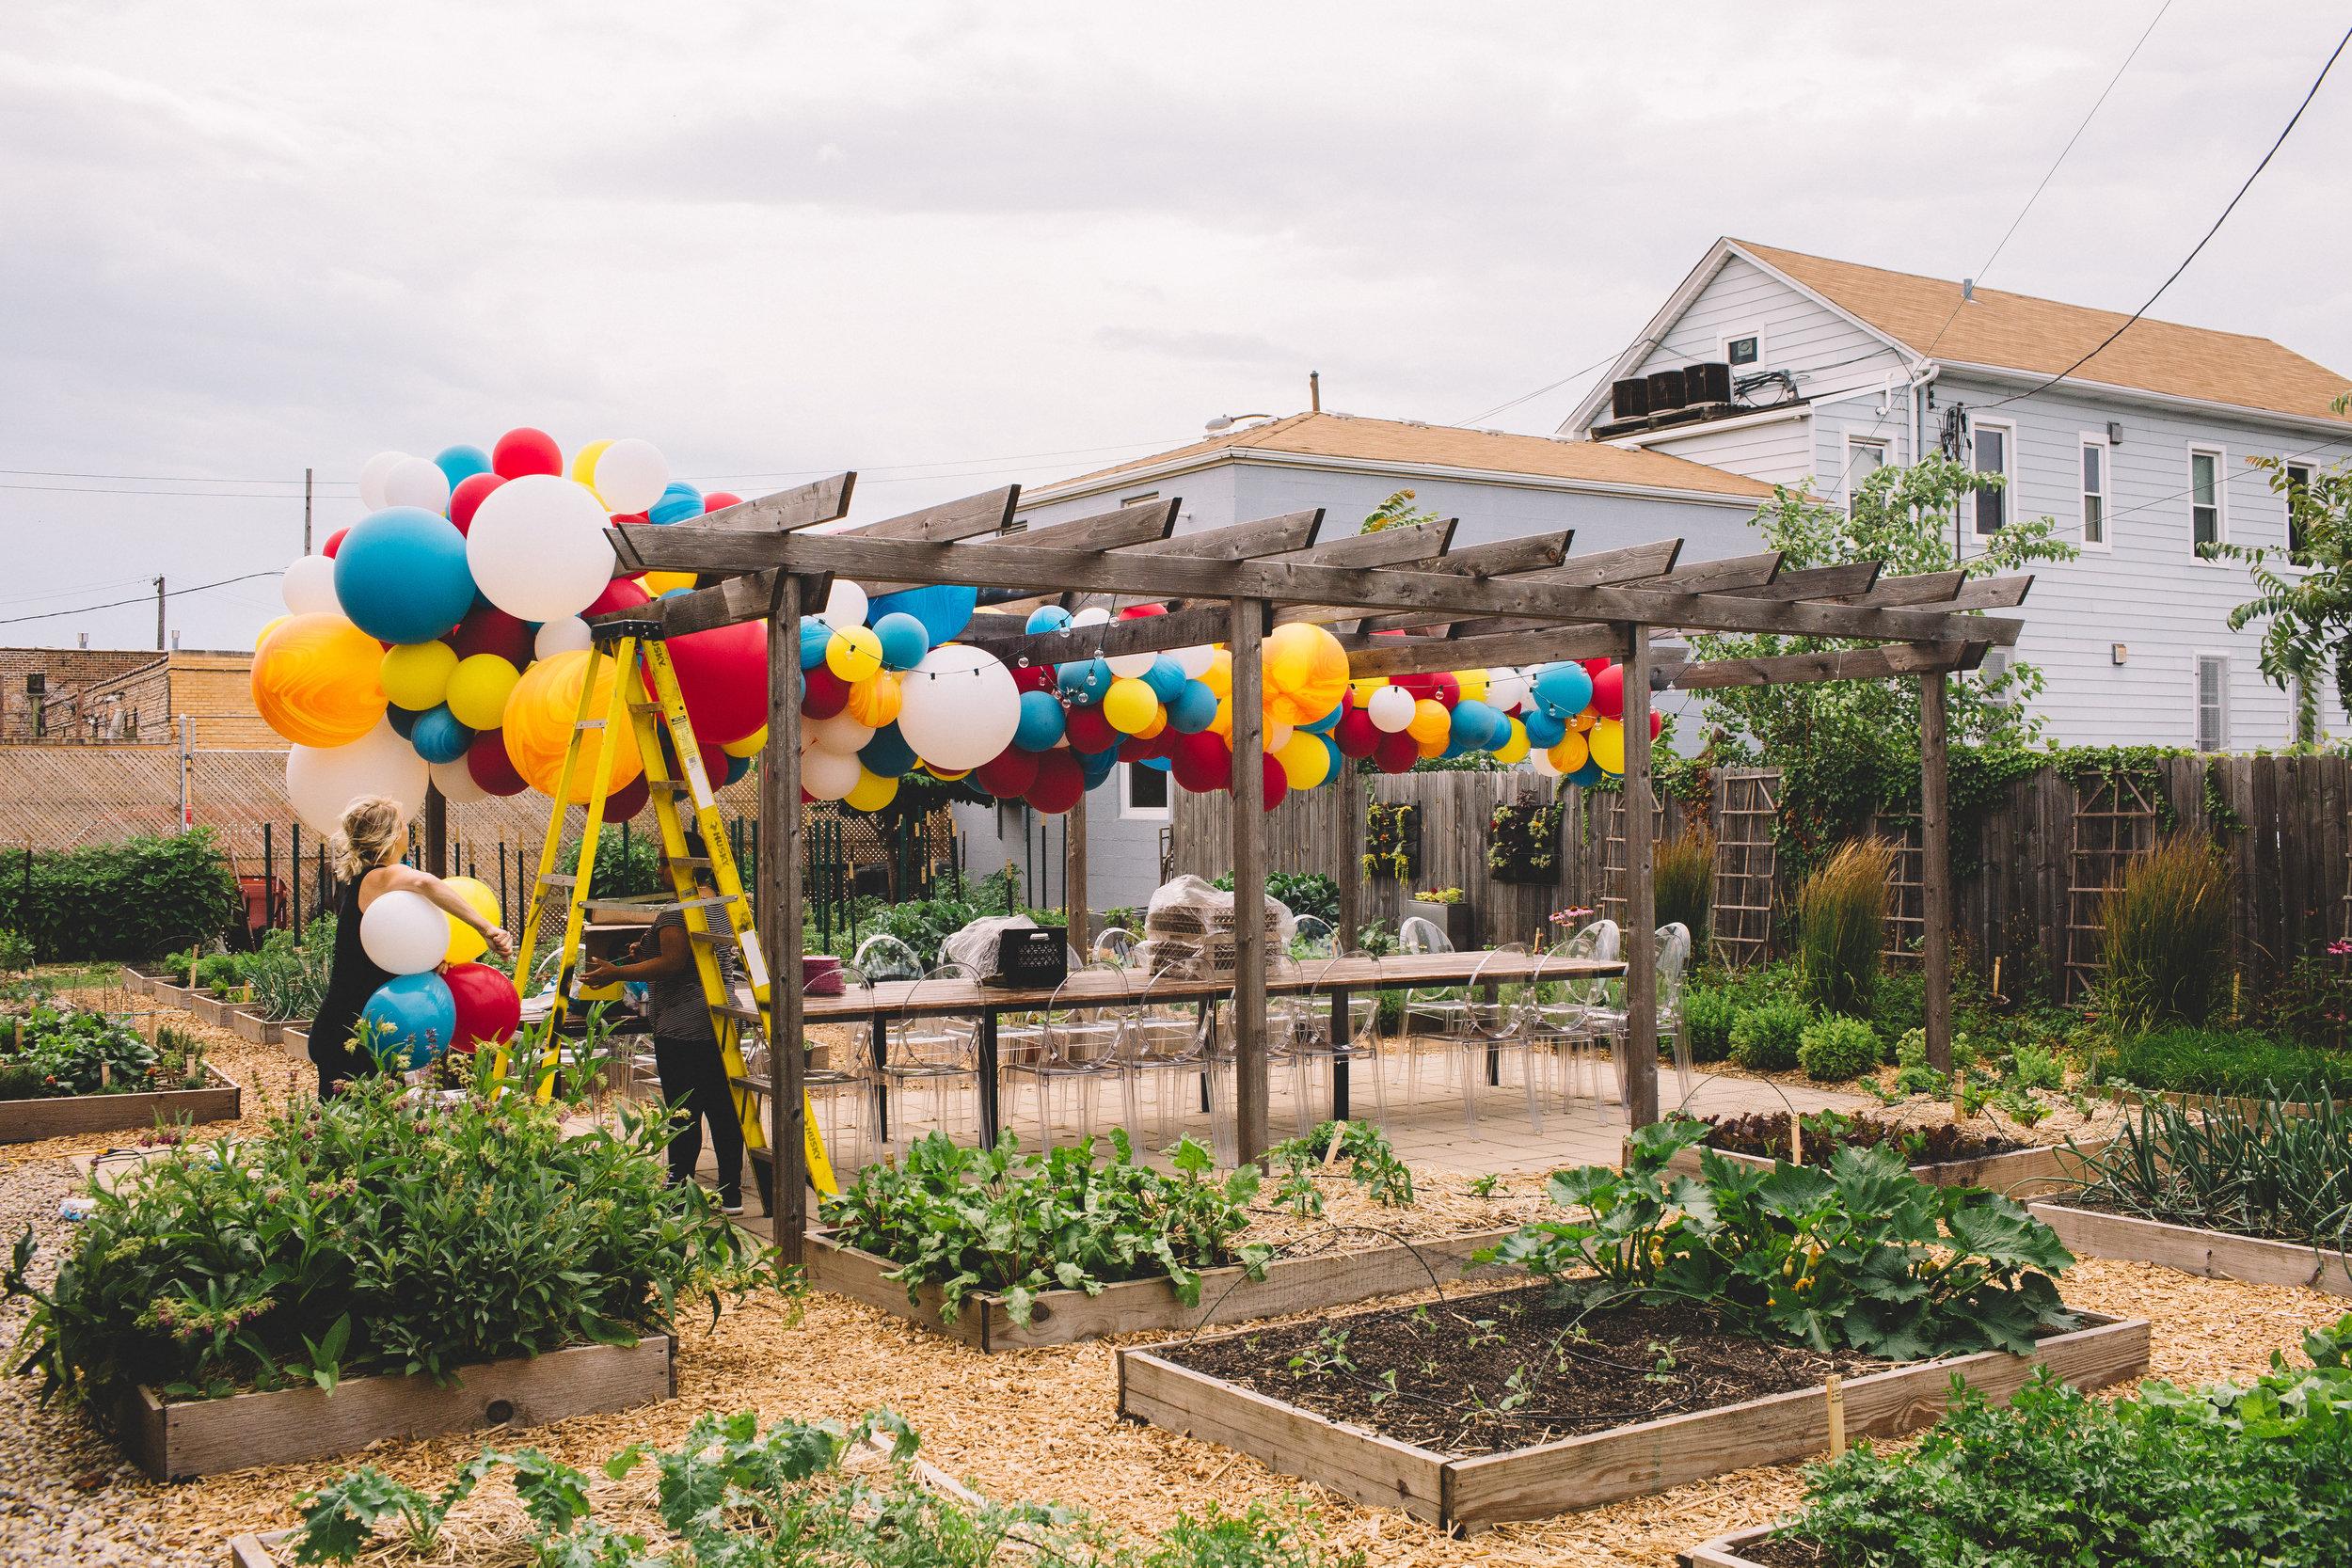 Fleur-Inc-Big-Delicious-Planet-Stephanie-Bassos-Photo-Nimblewell-Luft-Balloon